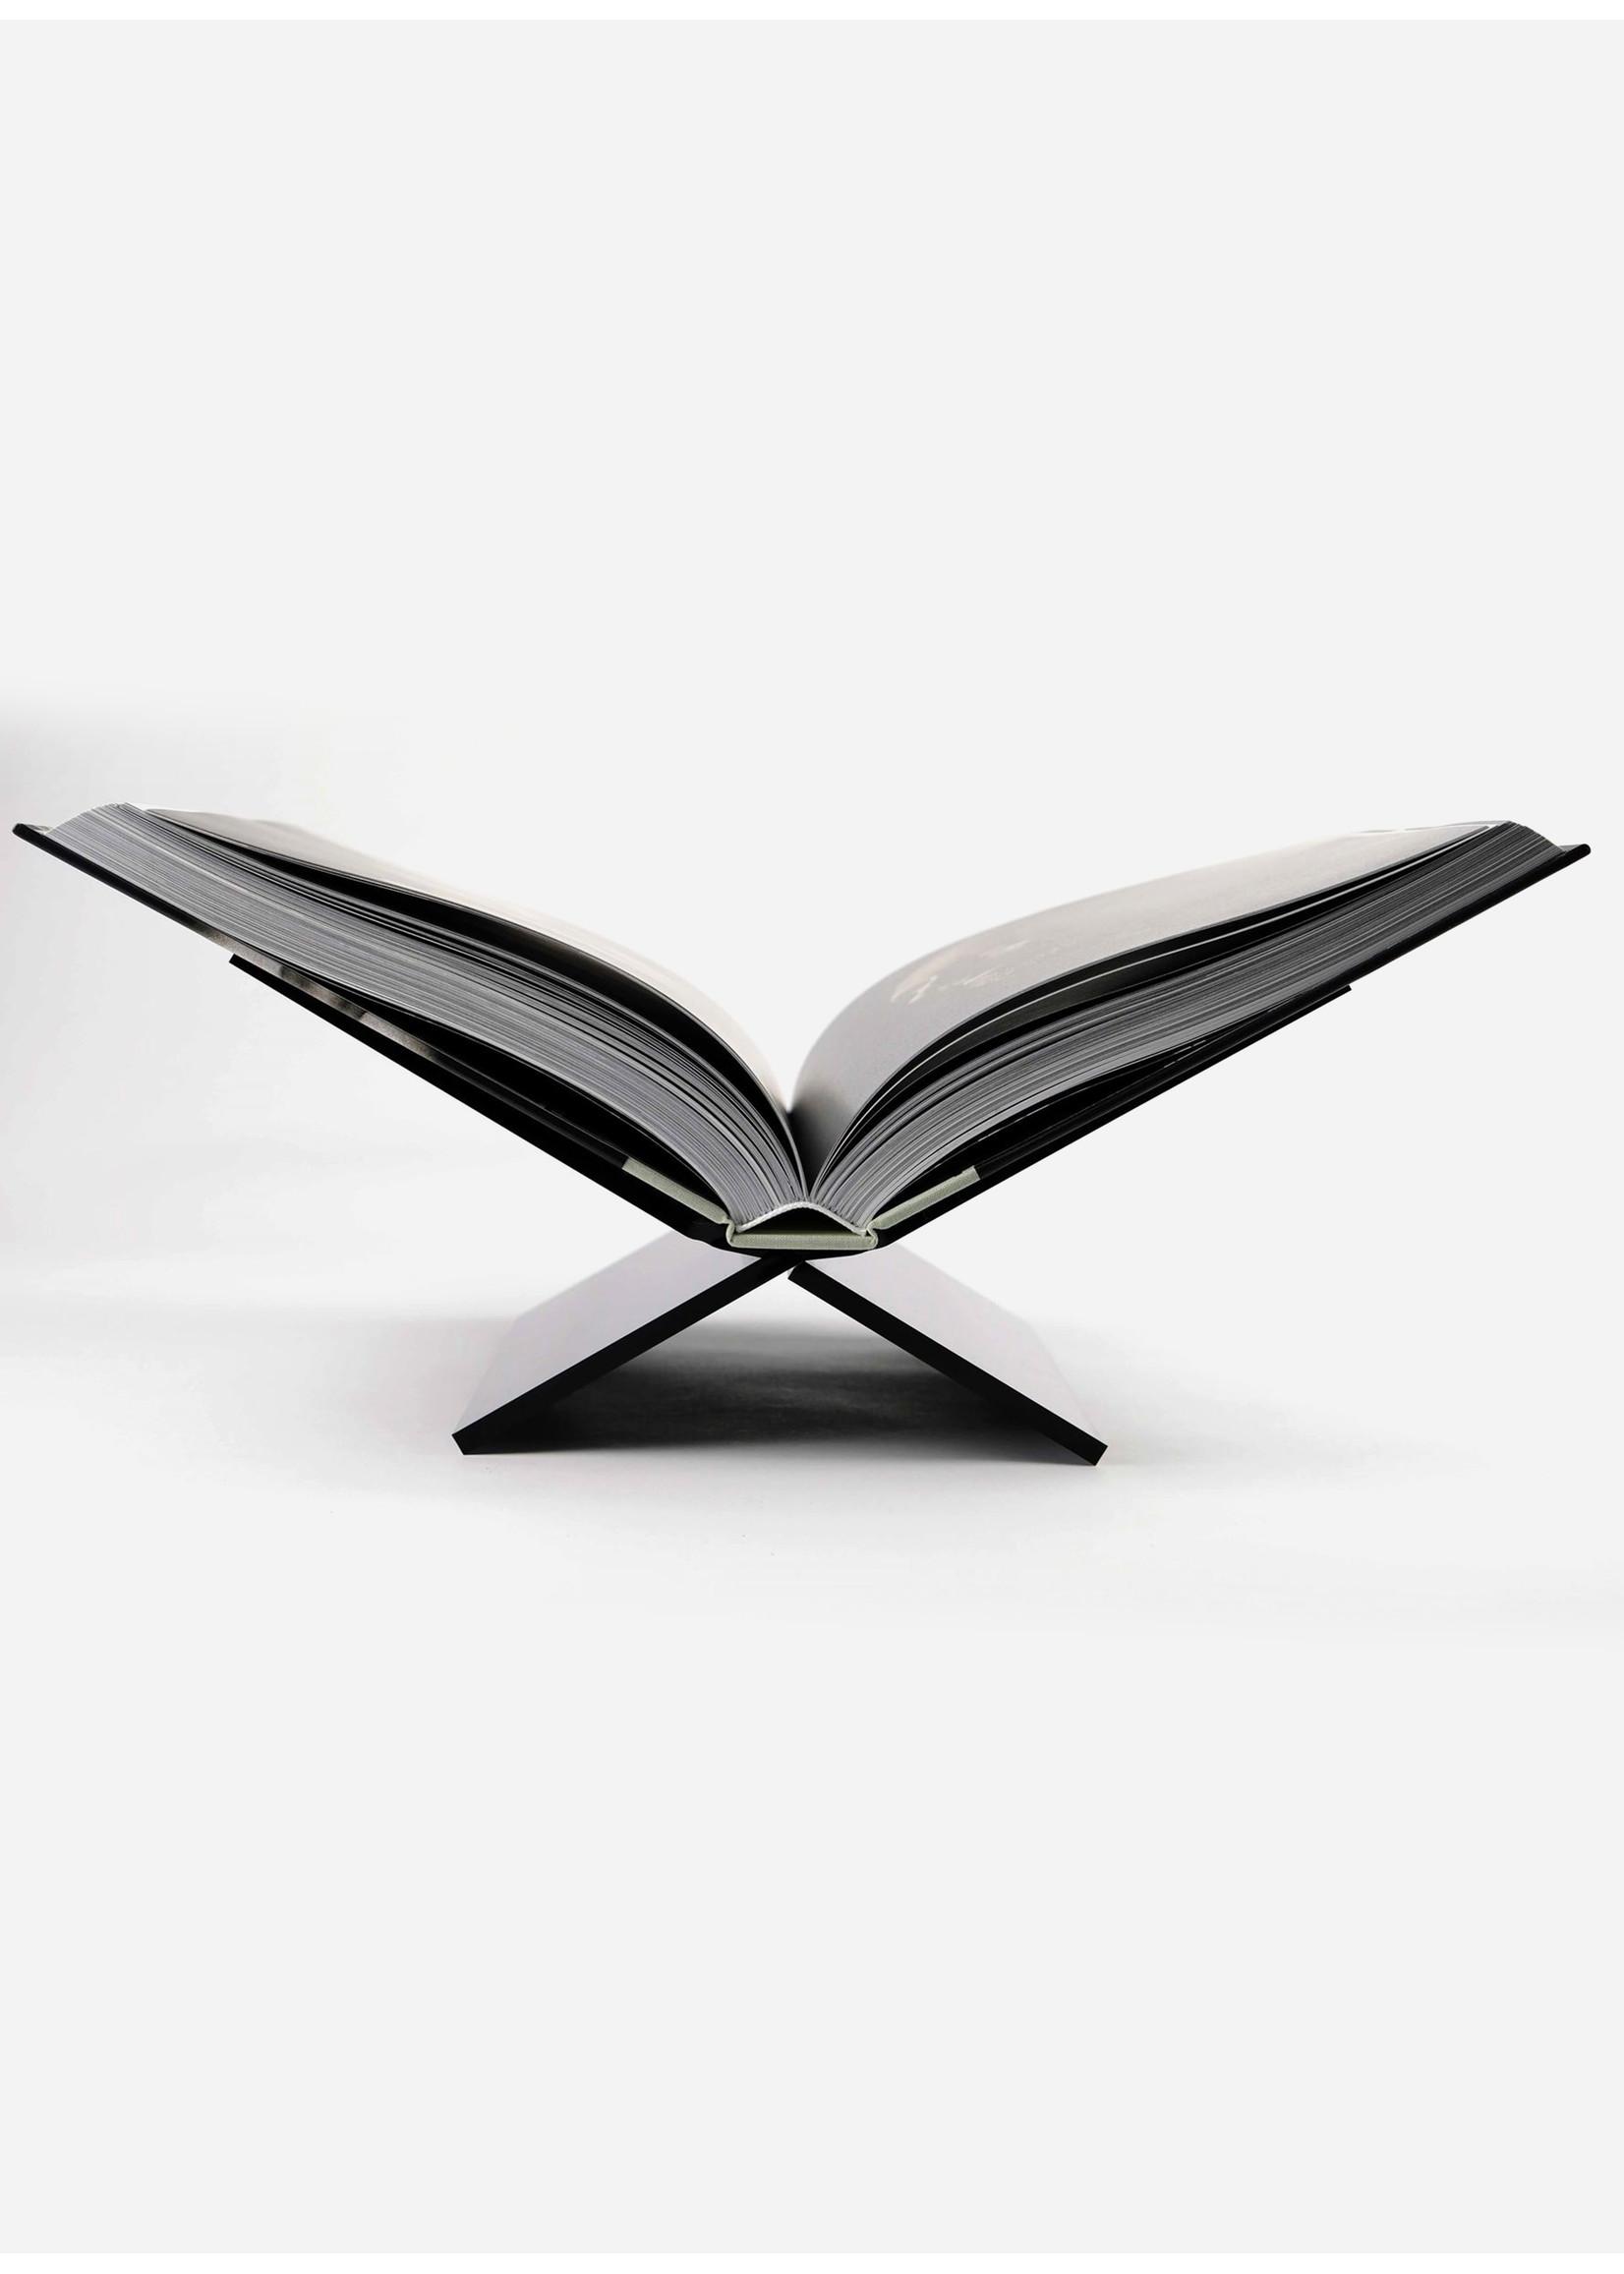 Teneues Books Bookstand black